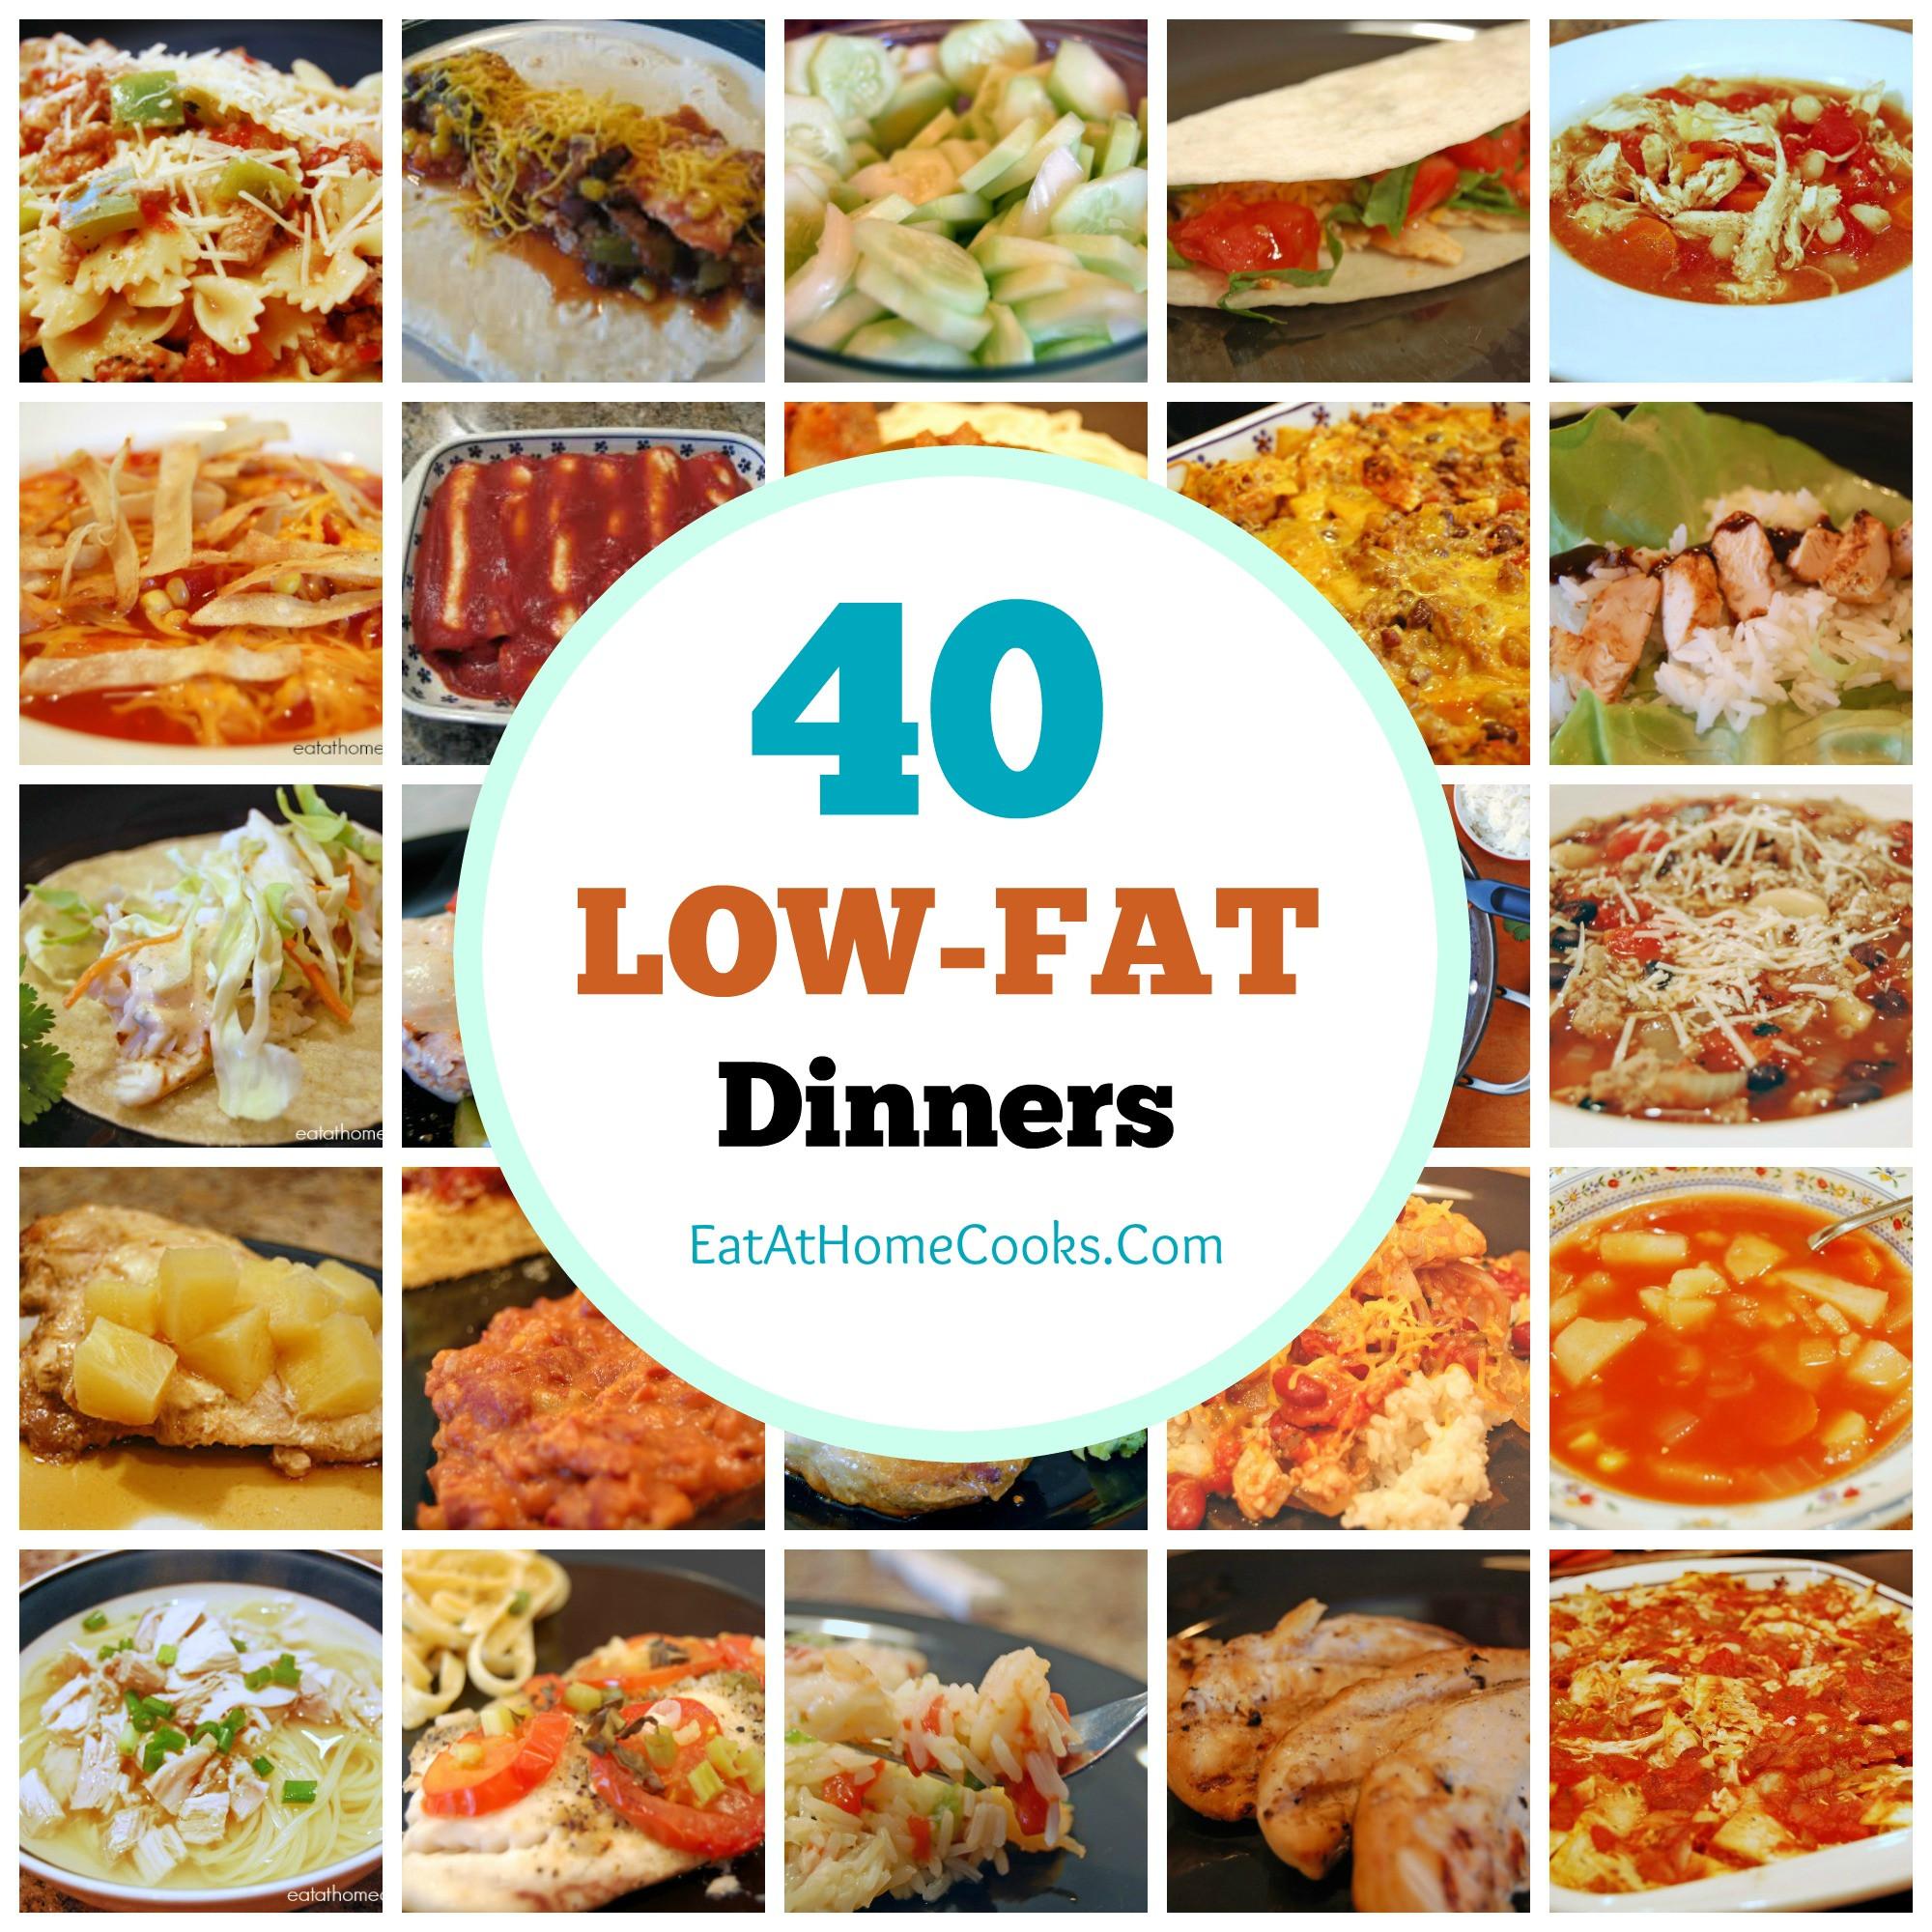 Low Fat Low Cholesterol Recipes  My Big Fat List of 40 Low Fat Recipes Eat at Home